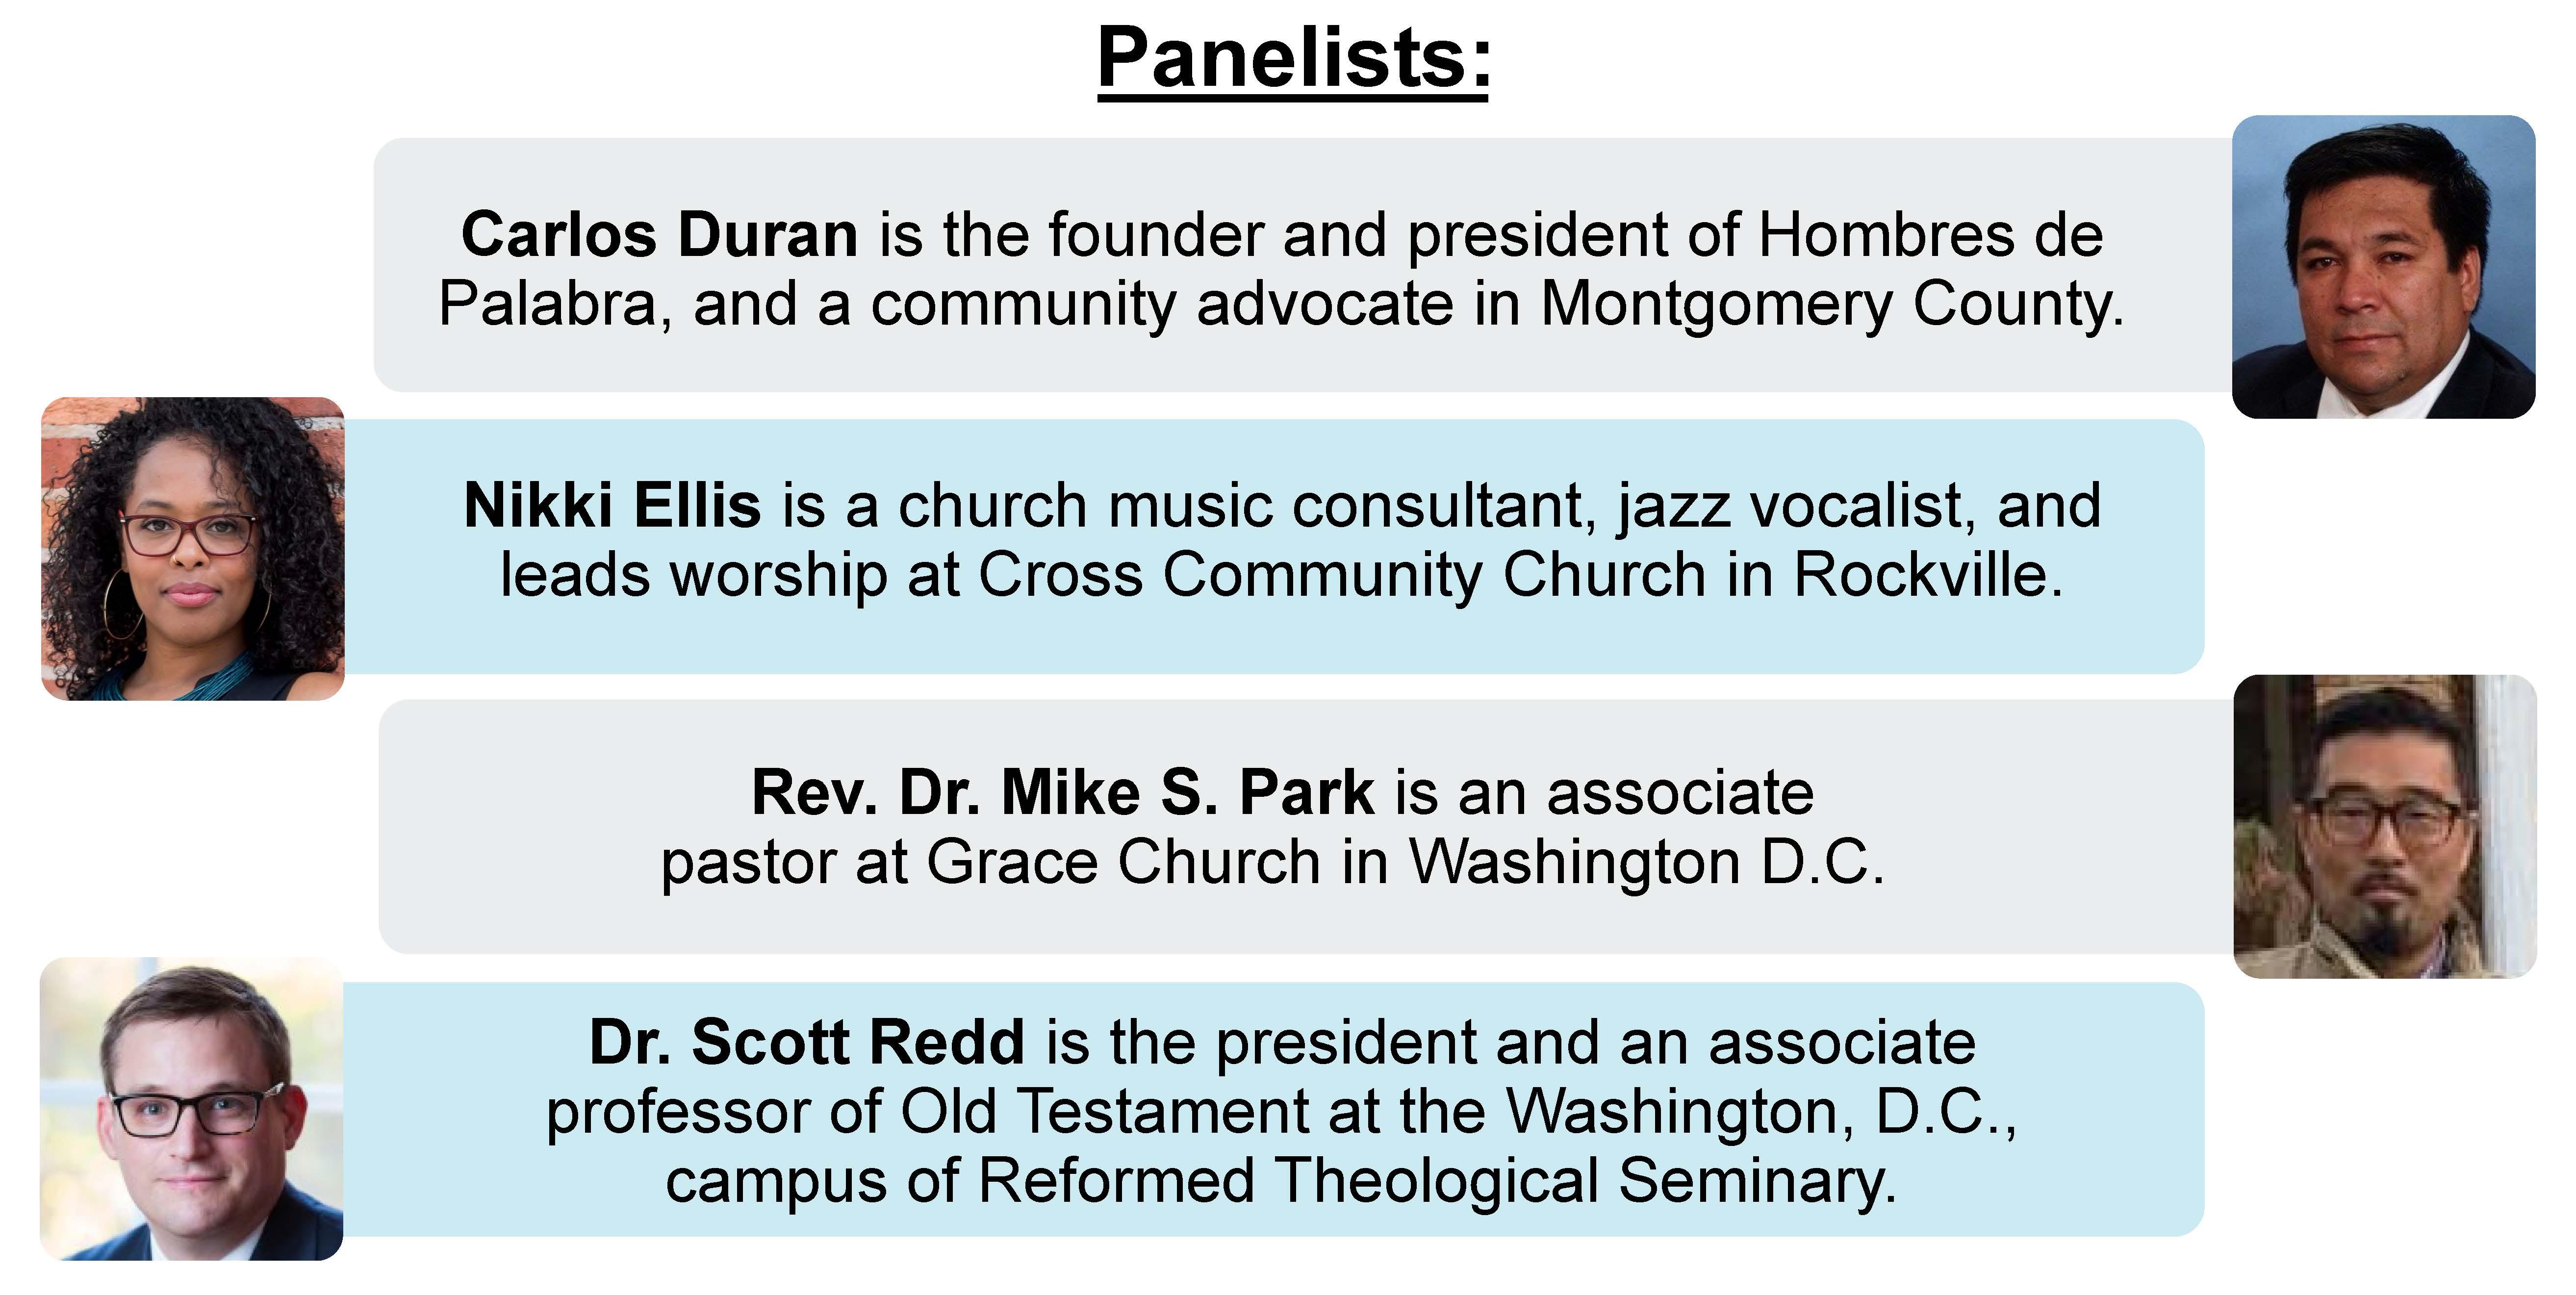 Panelists brief descriptions